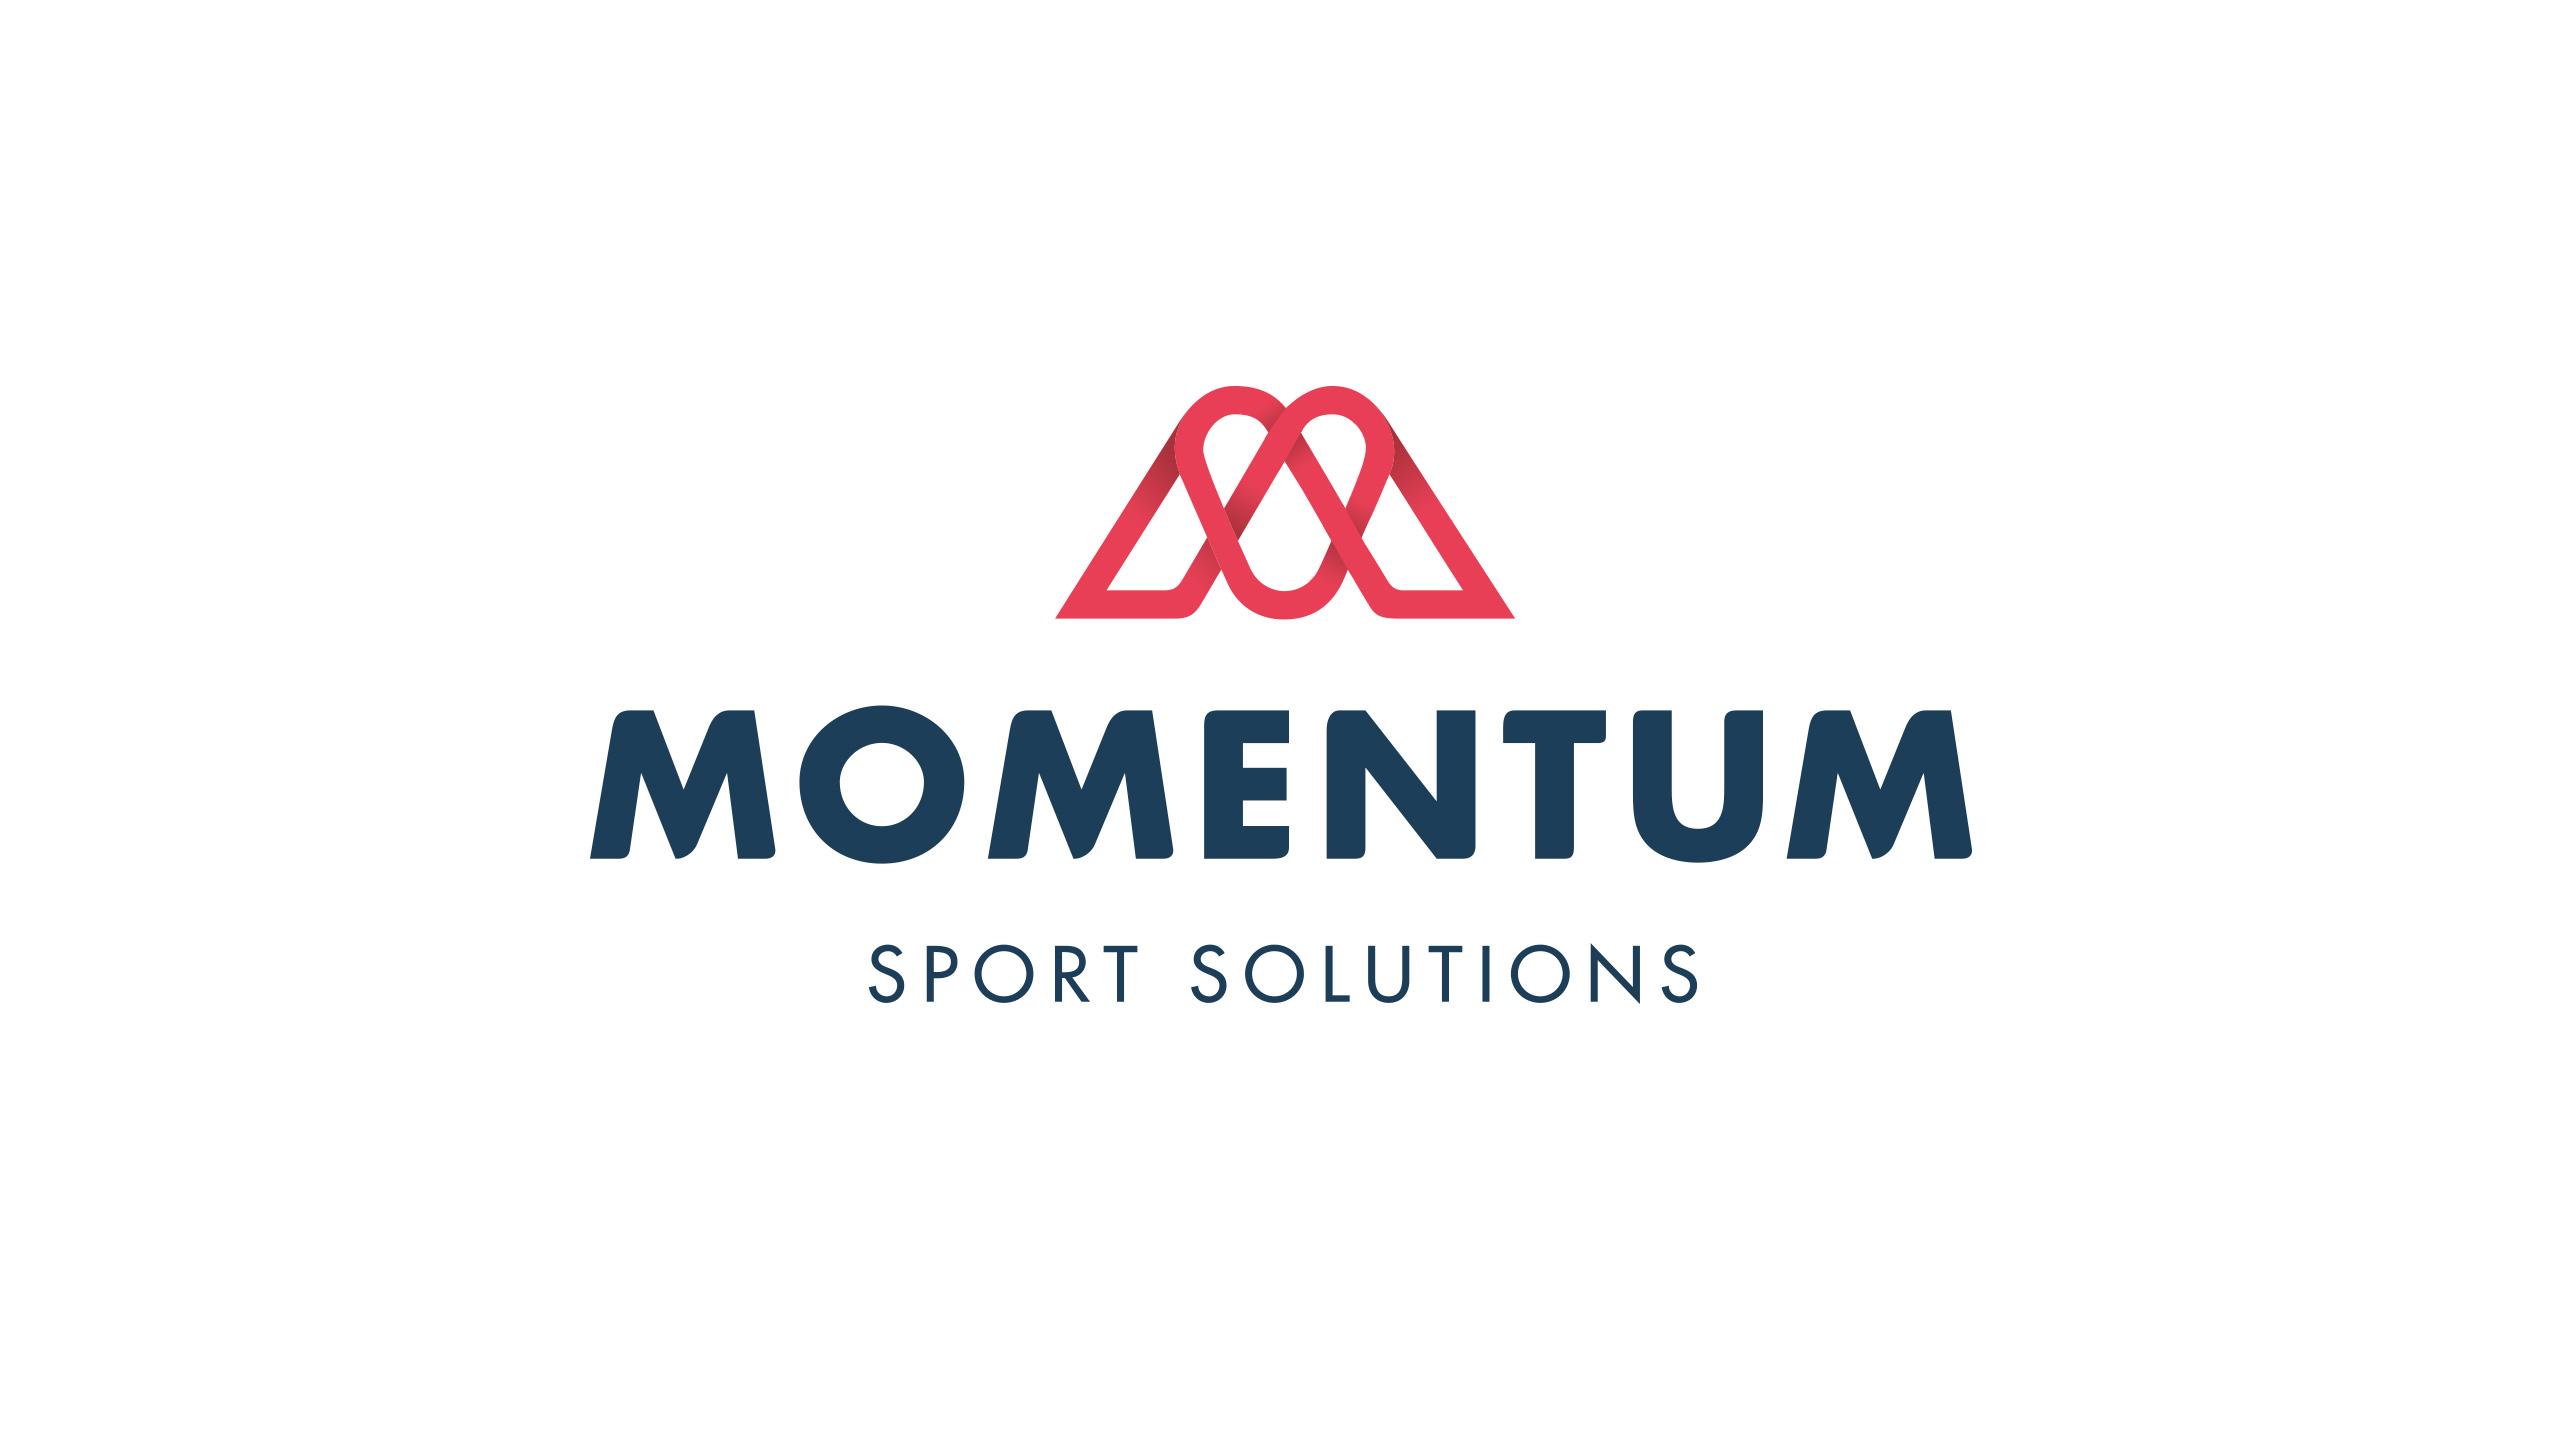 kamikaze_momentum_identidad_05